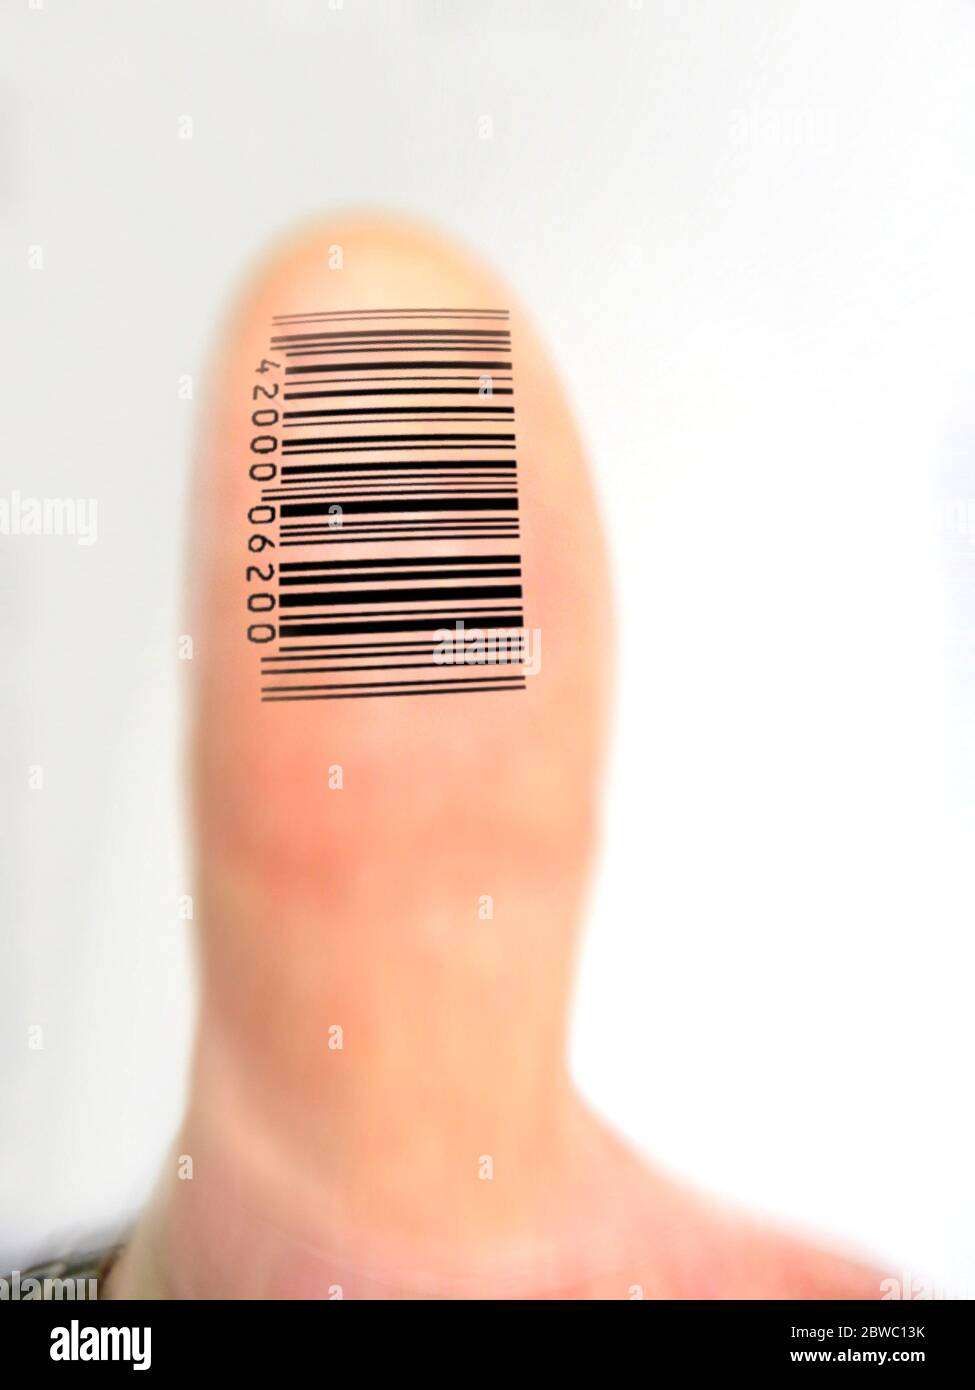 Digitaler Fingerabdruck, Daumen, Banque D'Images